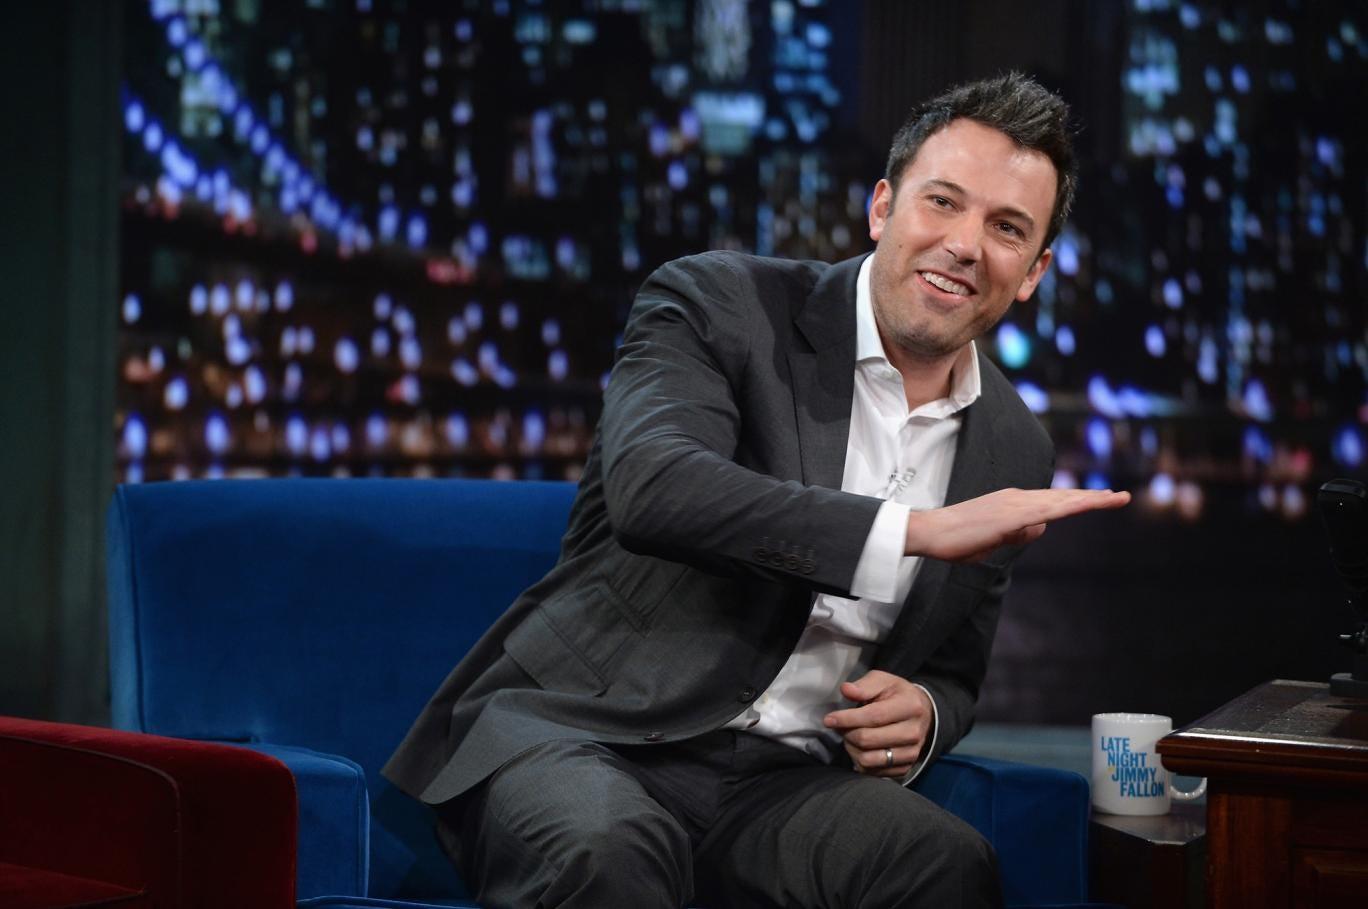 Ben Affleck on the Jimmy Fallon show